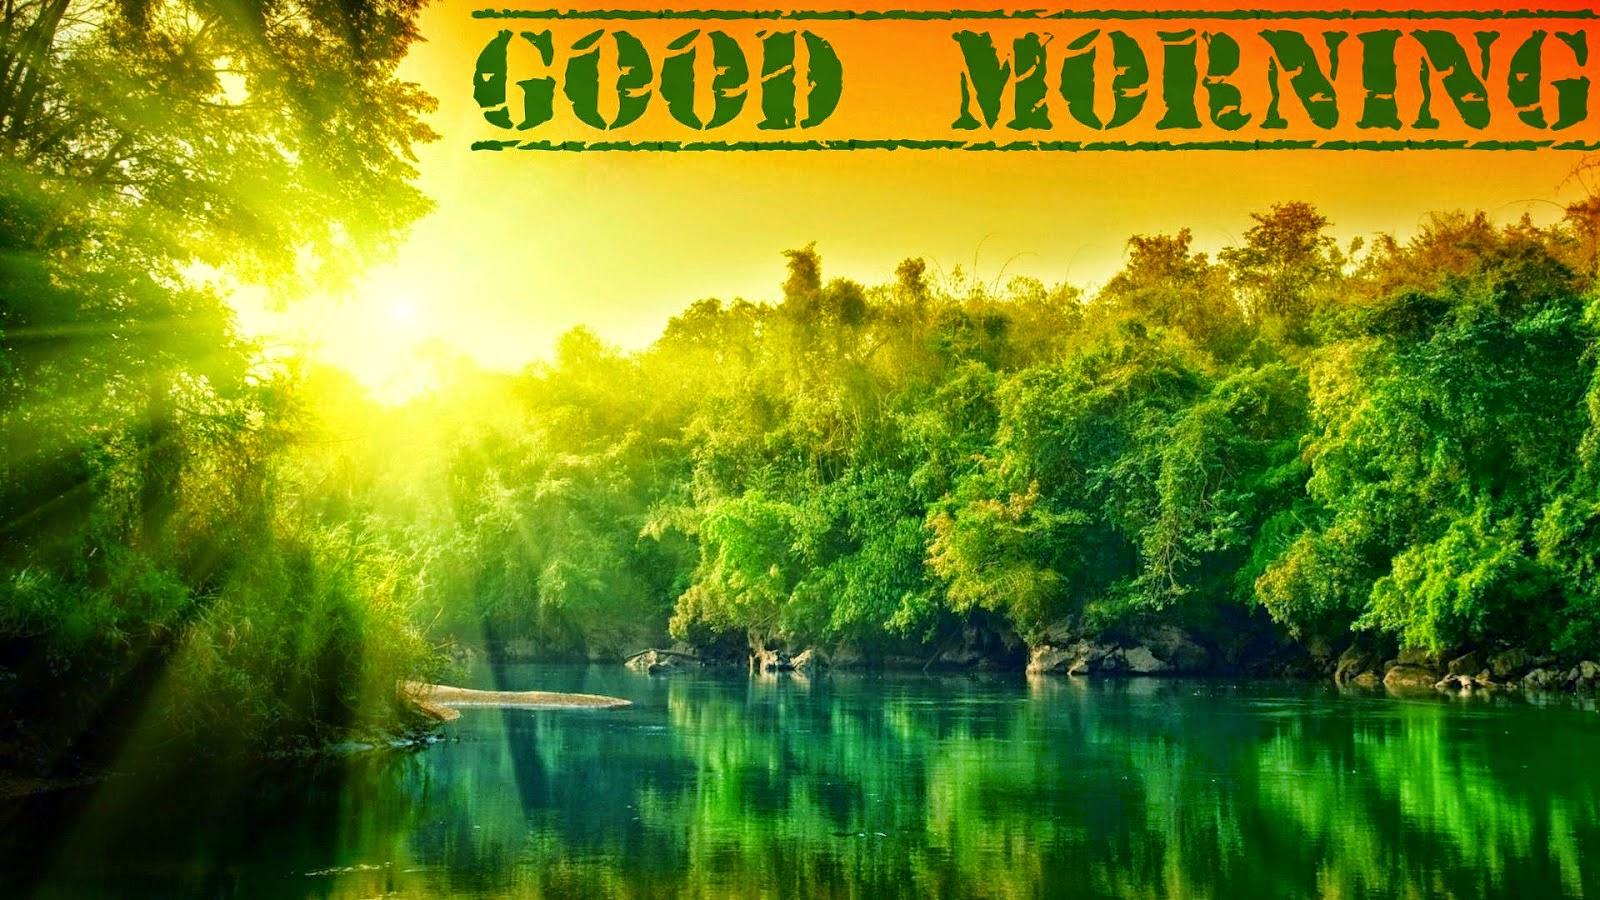 Download Free Hd Good Morning Wallpaper